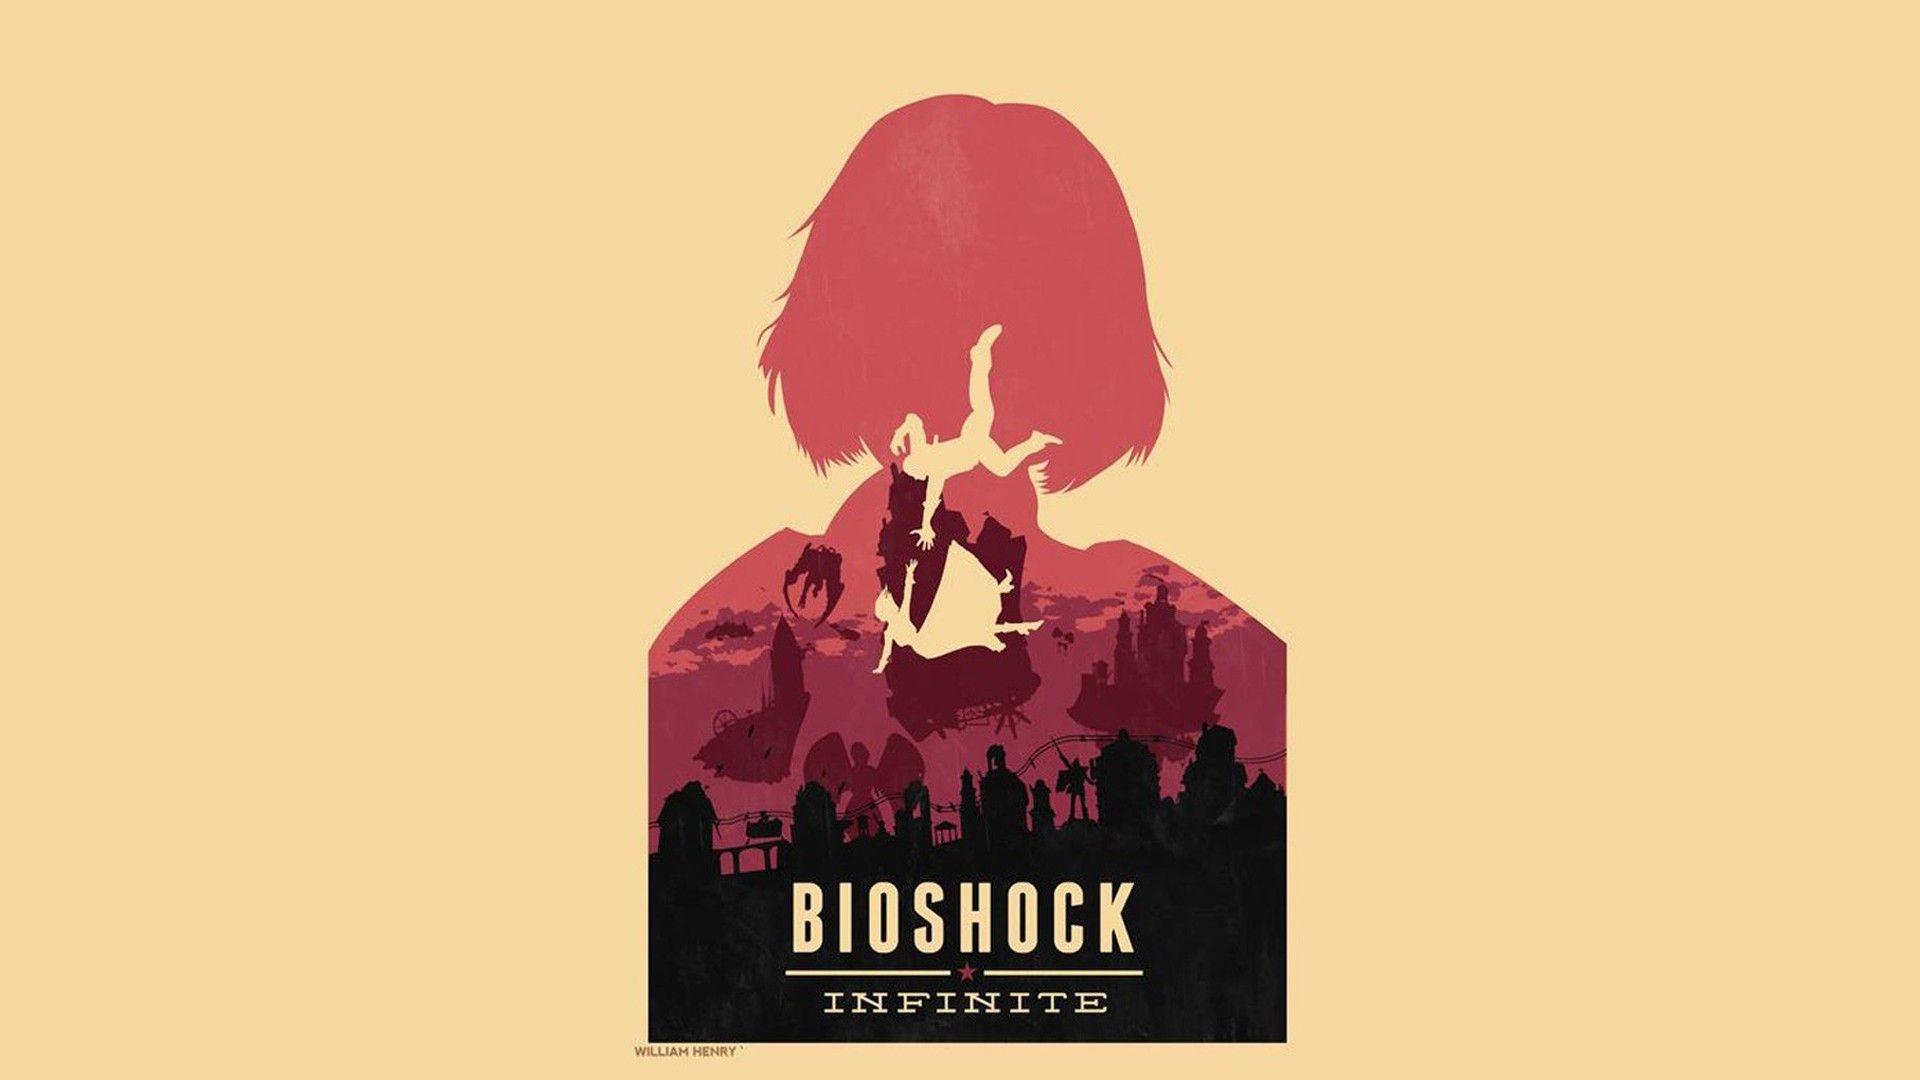 NCD: Game Bioshock Wallpapers, Beautiful Game Bioshock Wallpapers 1920×1080  Bioshock The Collection Wallpapers (41 Wallpapers) | Adorable Wallpape…